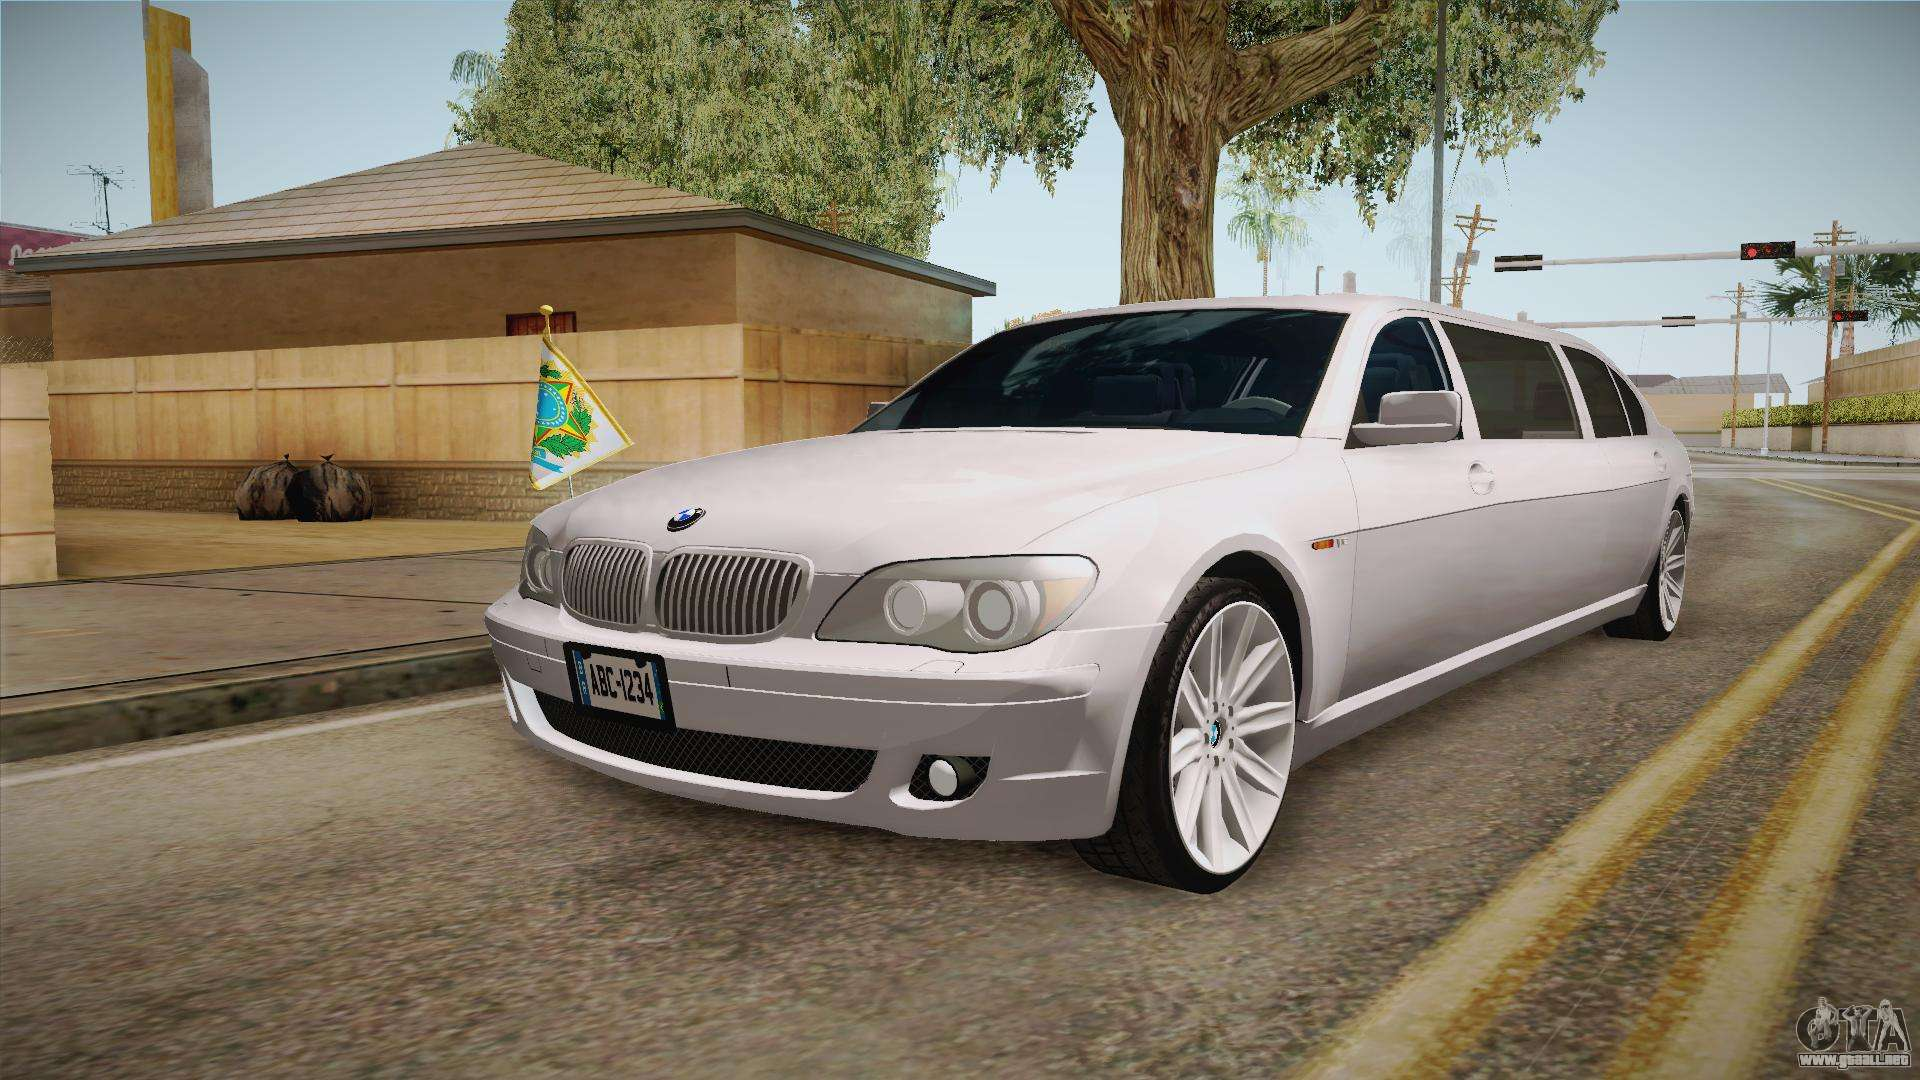 bmw e66 7 series limousine para gta san andreas. Black Bedroom Furniture Sets. Home Design Ideas